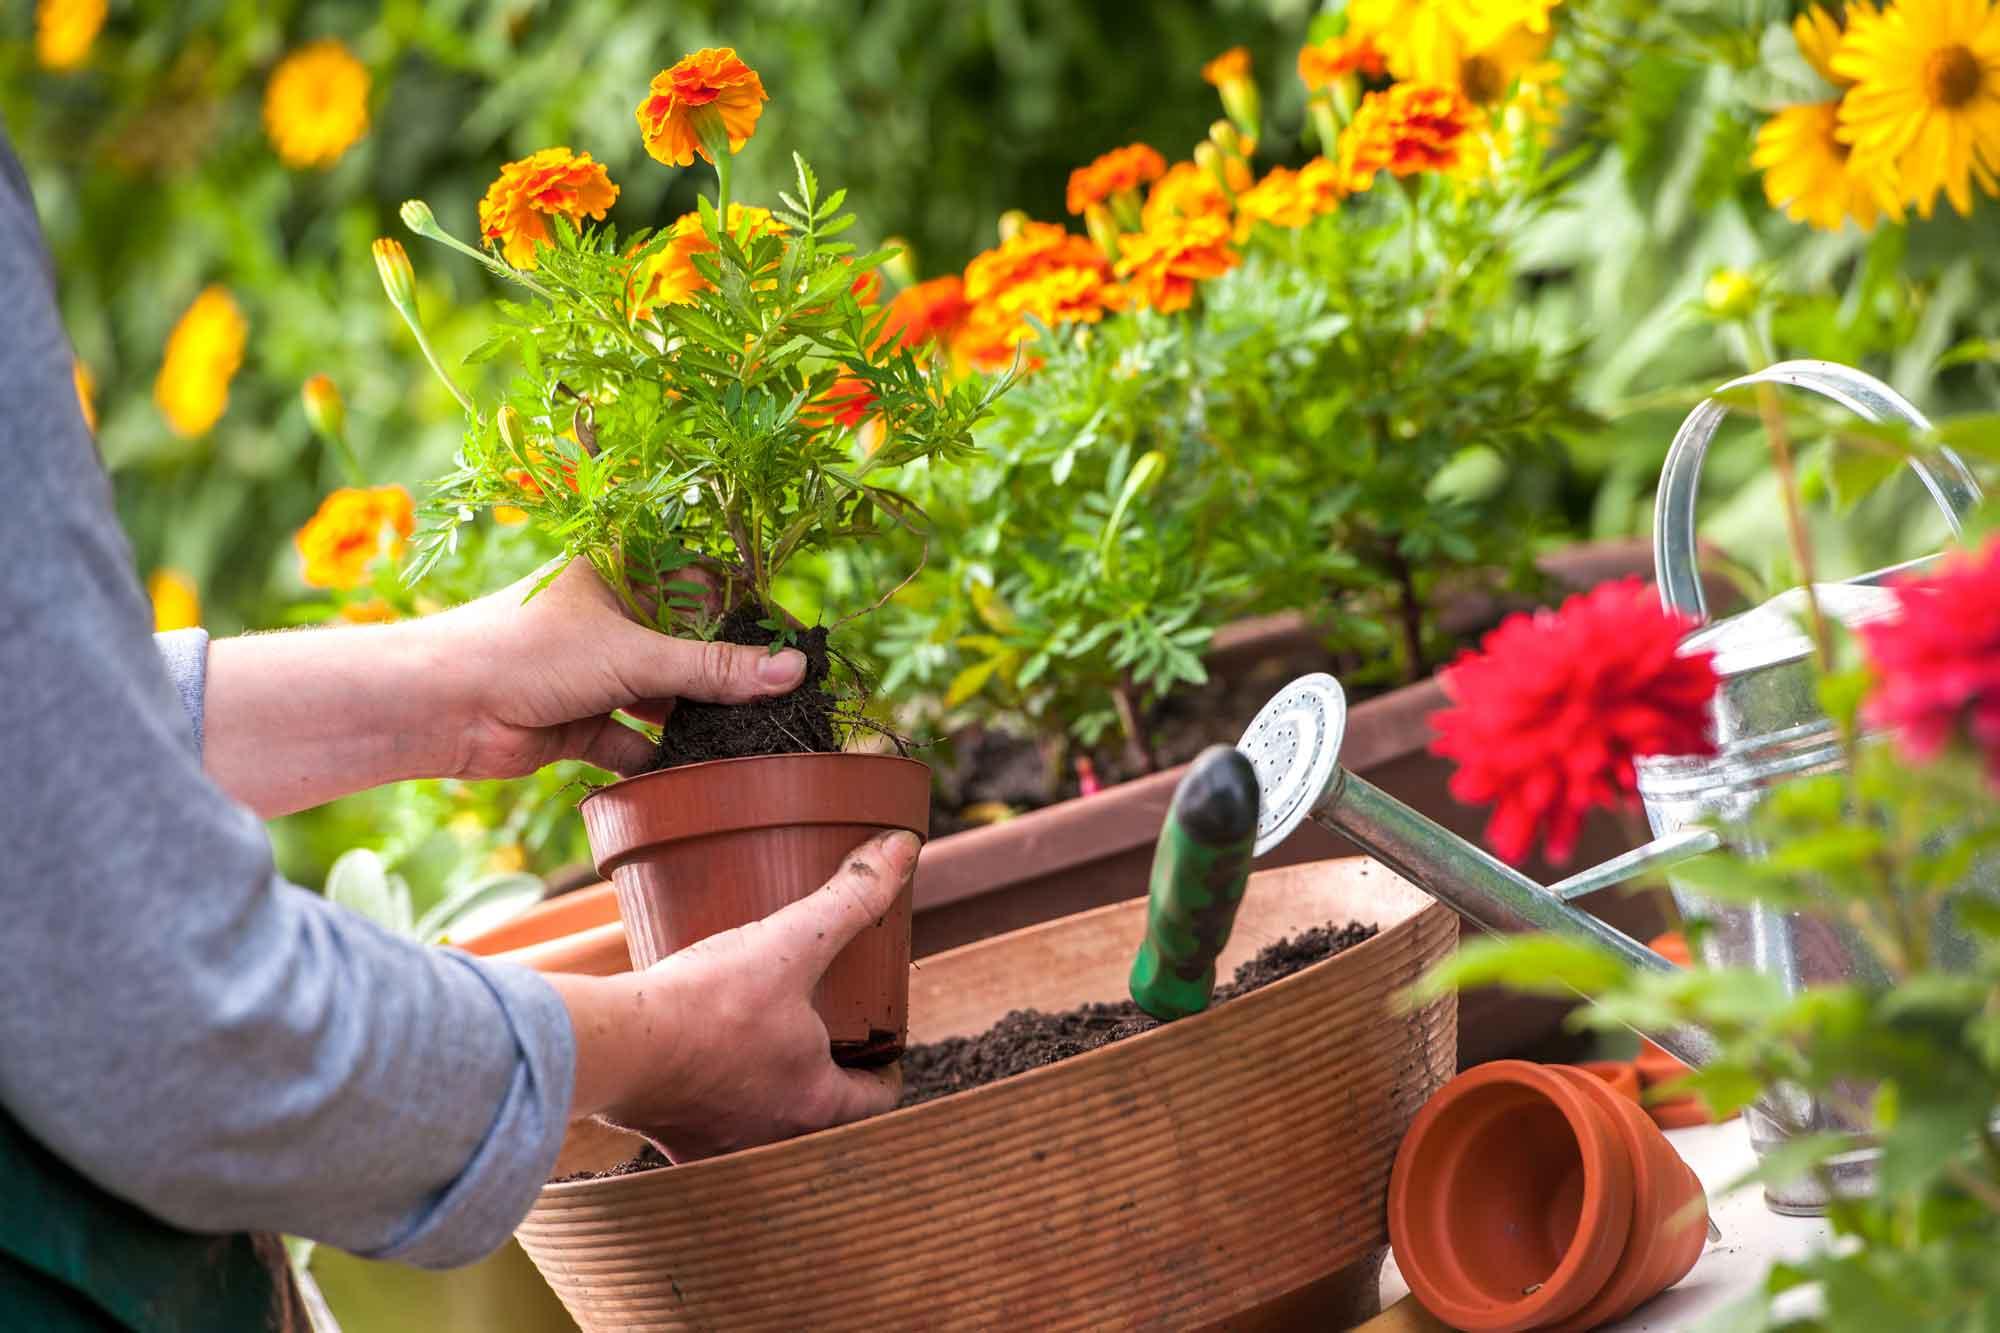 planting-gardens 100+ Surprising Garden Design Ideas You Should Not Miss in 2021